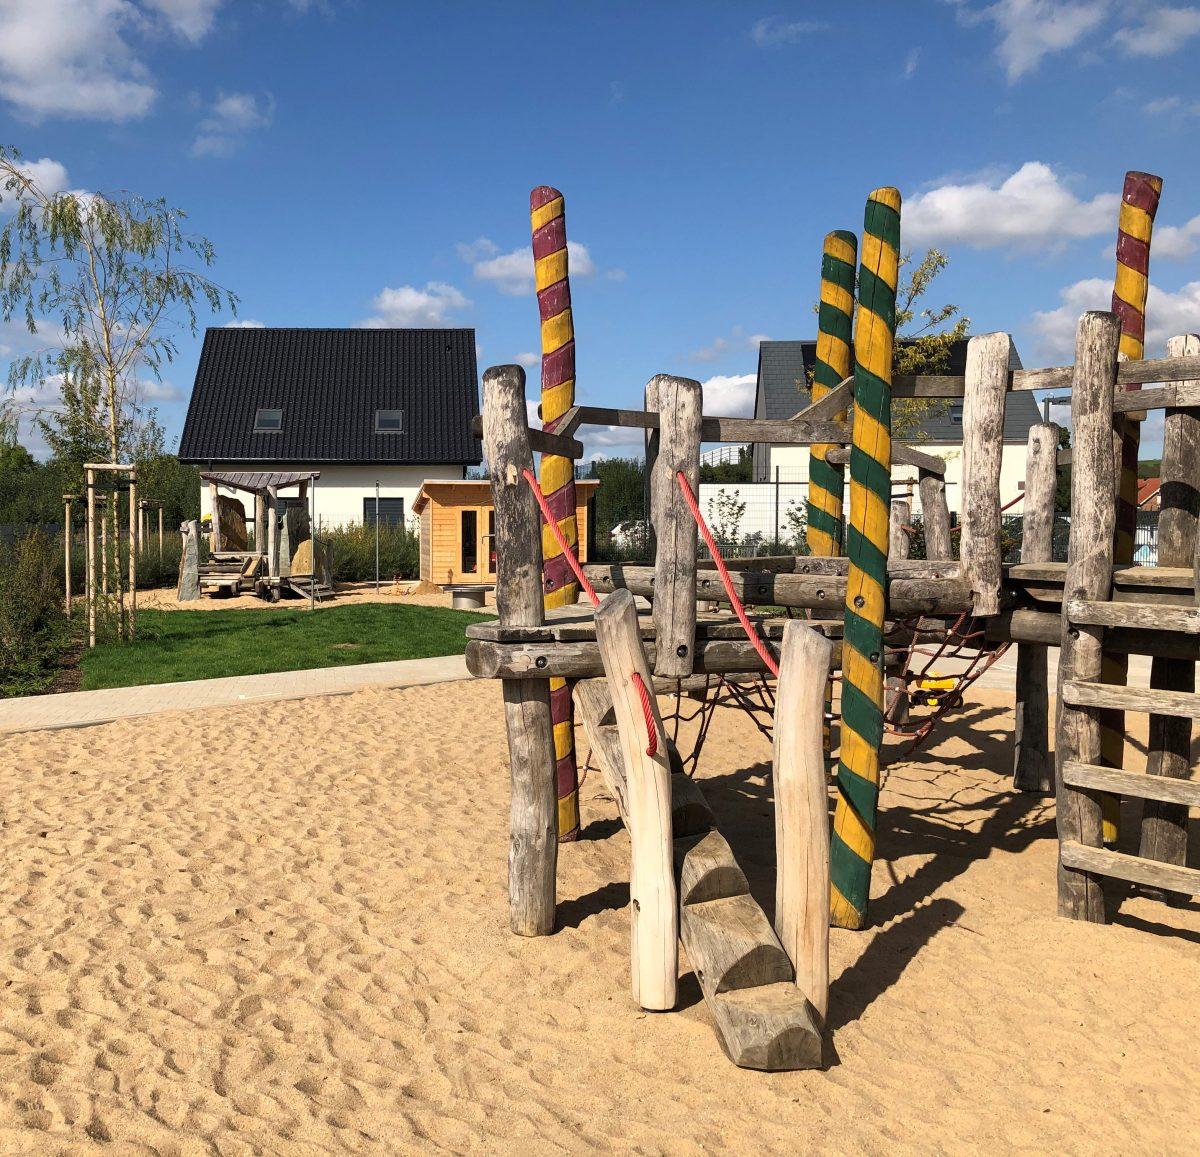 Kindertagesstätte Blausteinsweg, Neuss